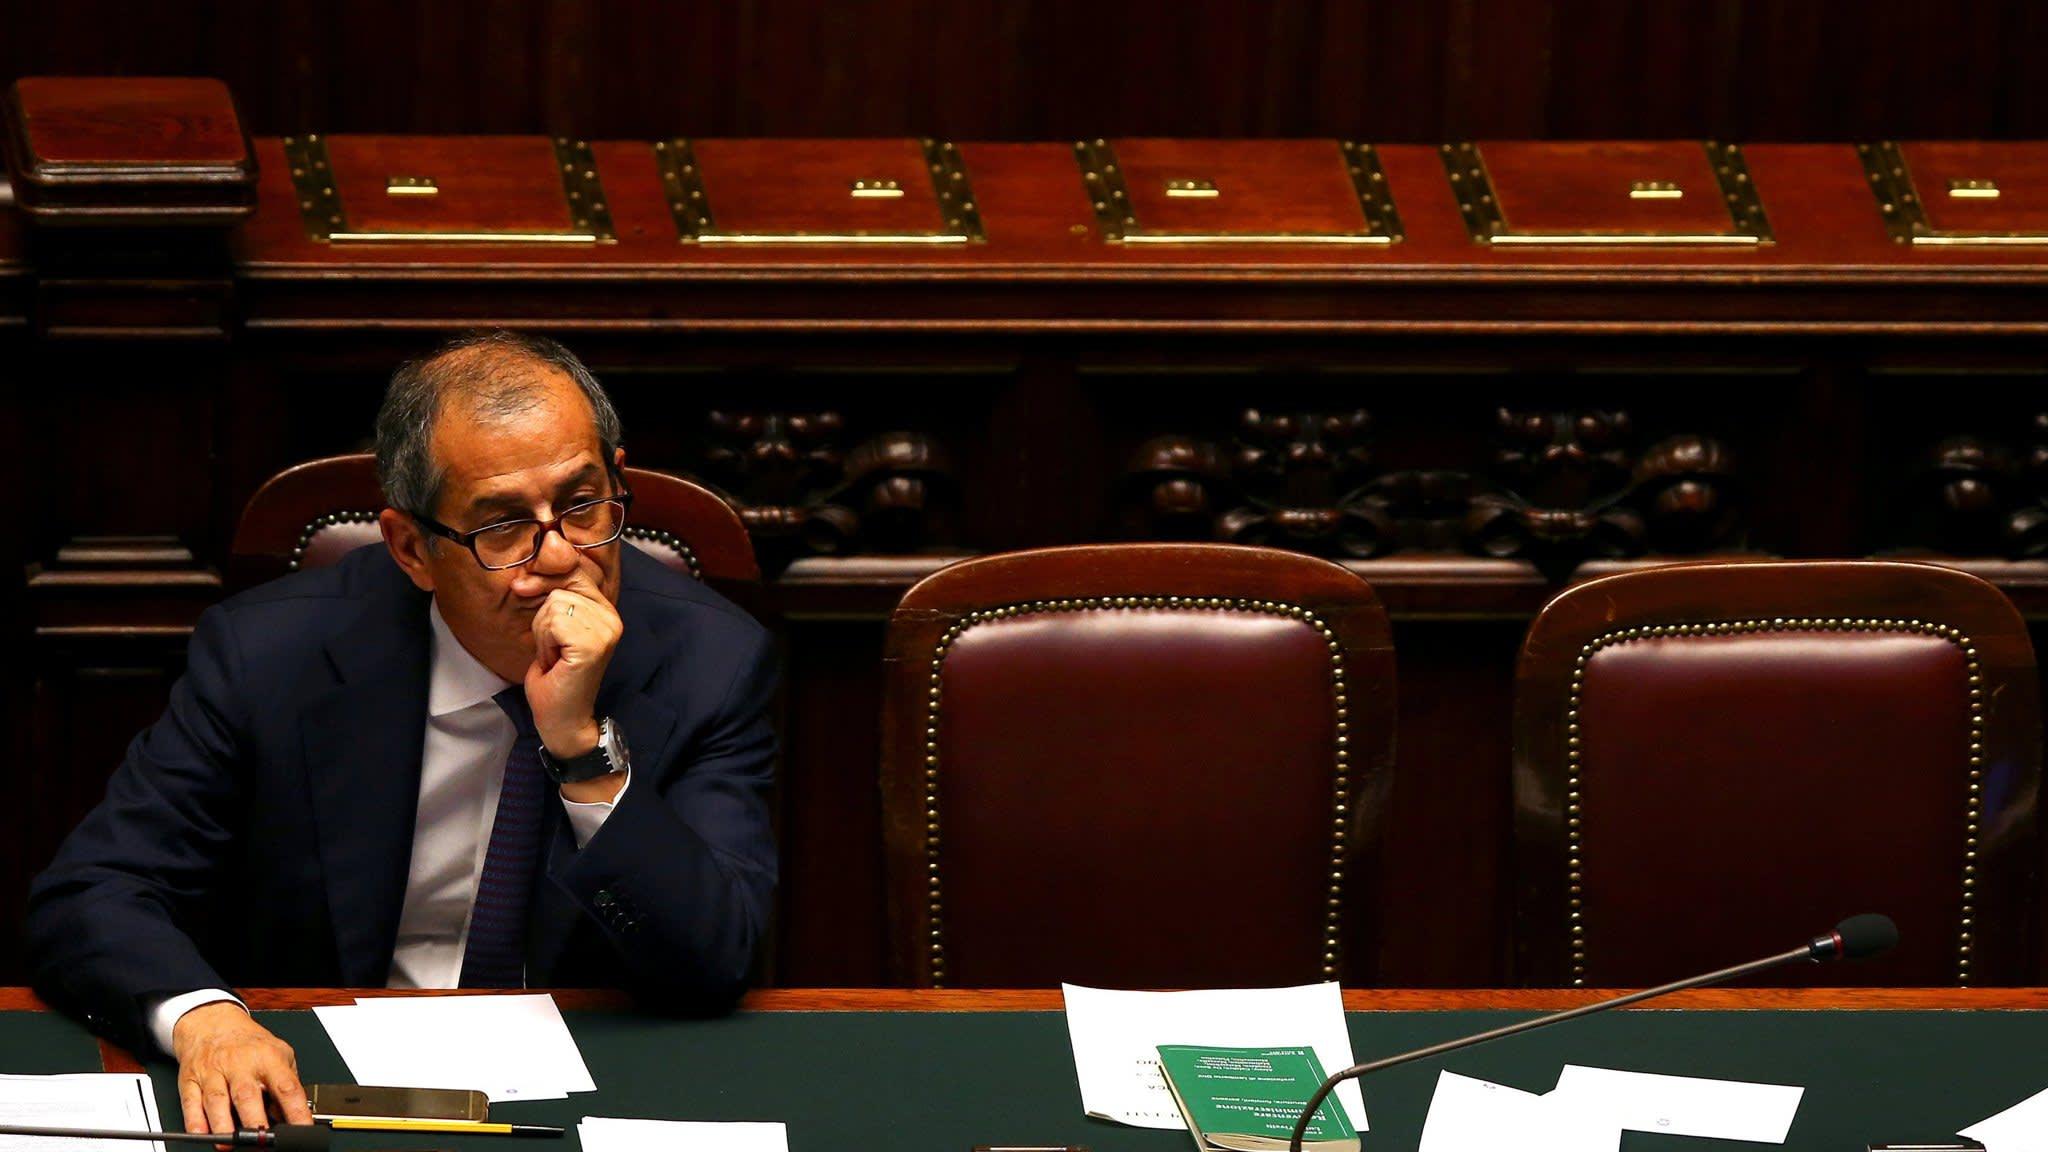 Italian bonds under pressure amid budget confusion